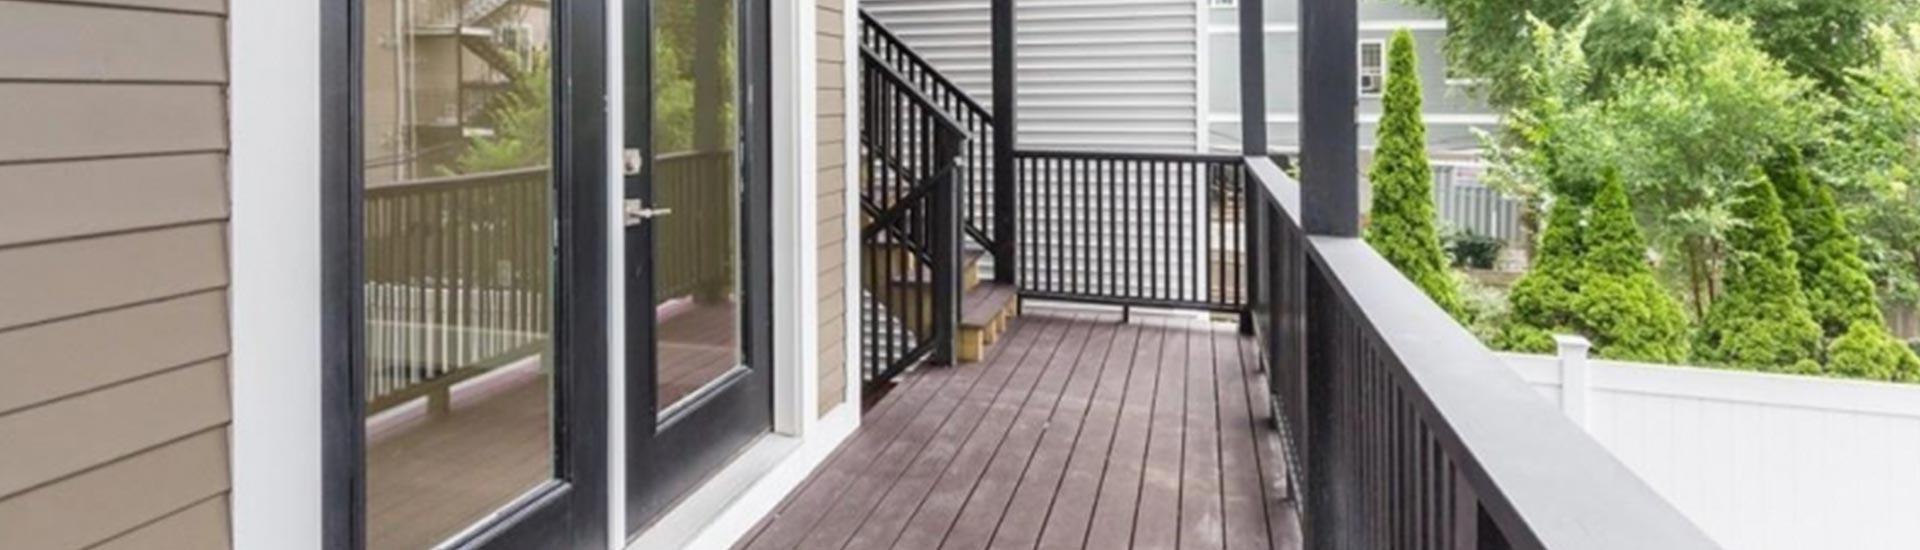 roof-deck-1